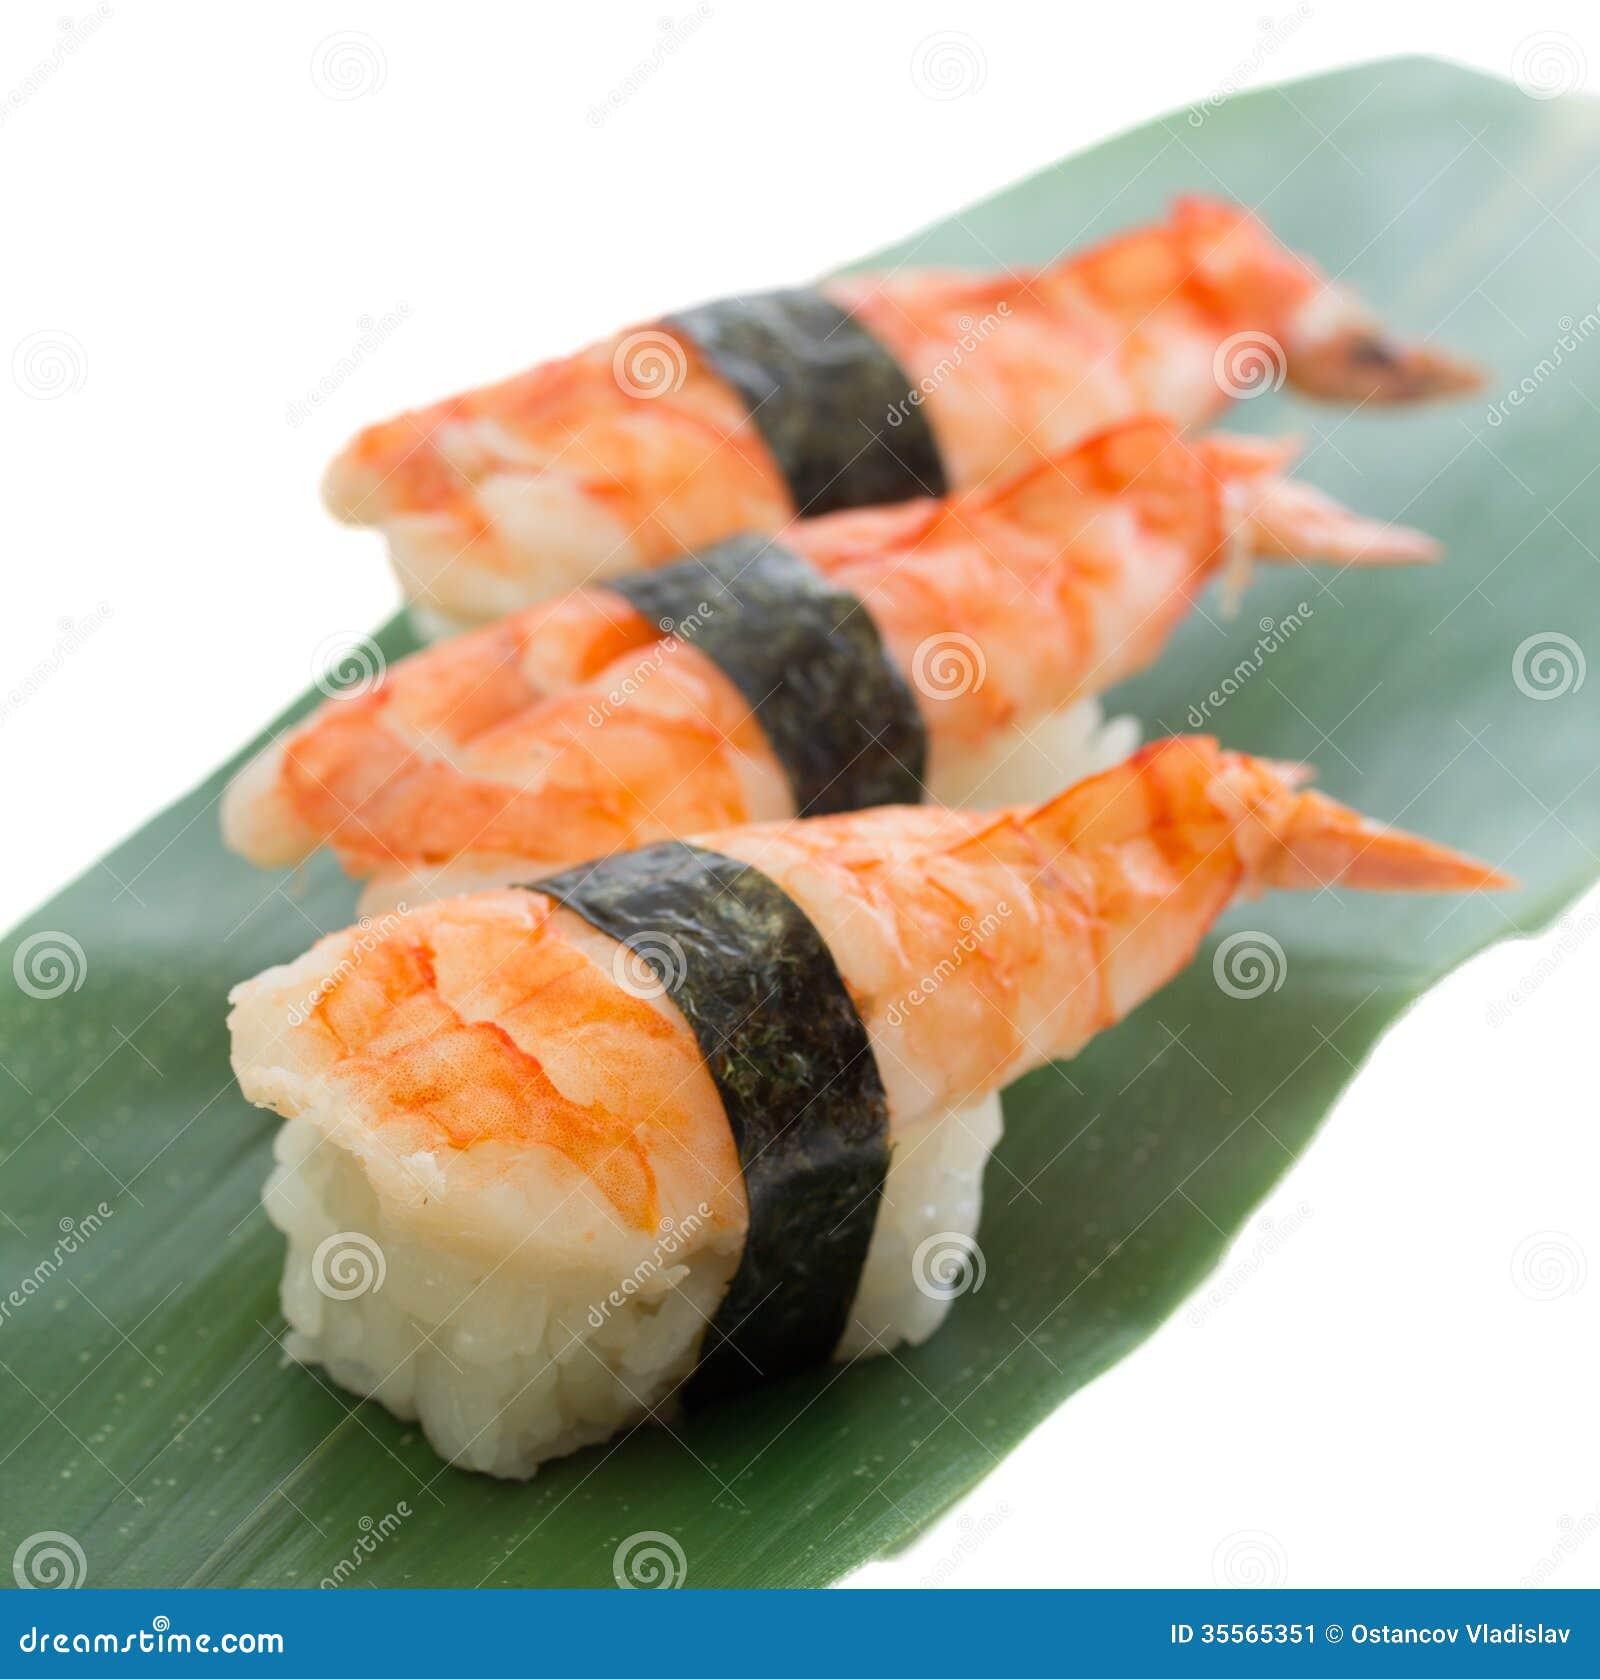 Kitchen Design App Shrimp Sushi Nigiri On Wooden Plate Isolated On White